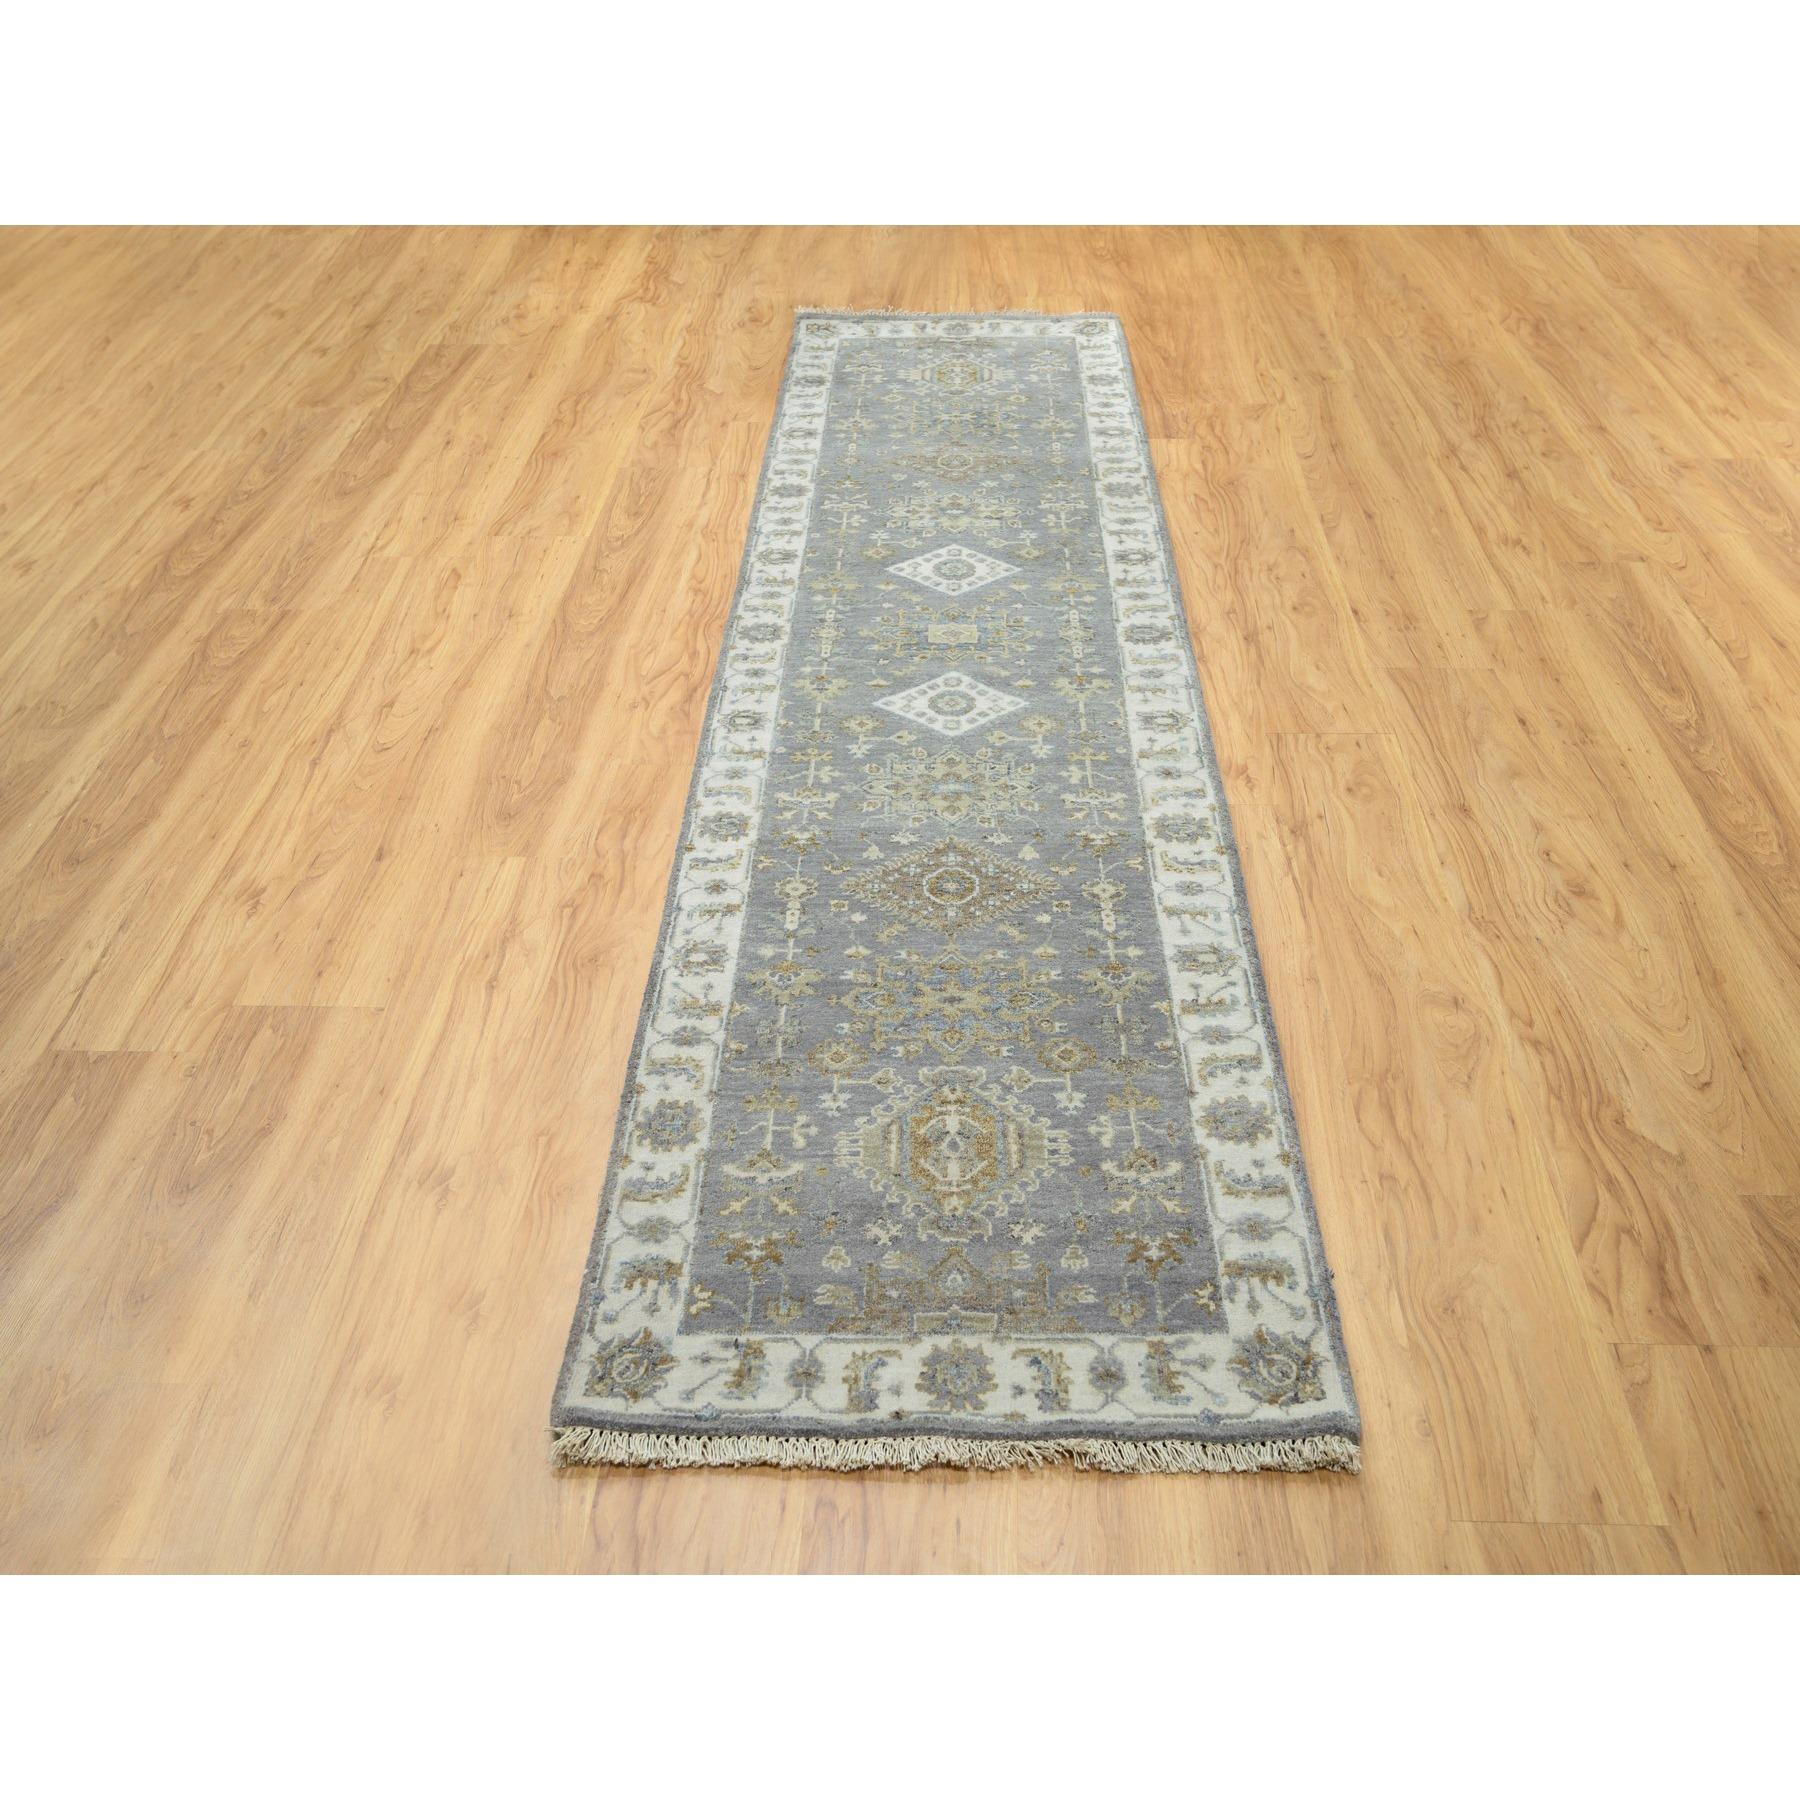 "2'7""x9'10"" Gray Karajeh Design Pure Wool Hand Knotted Oriental Runner Rug"